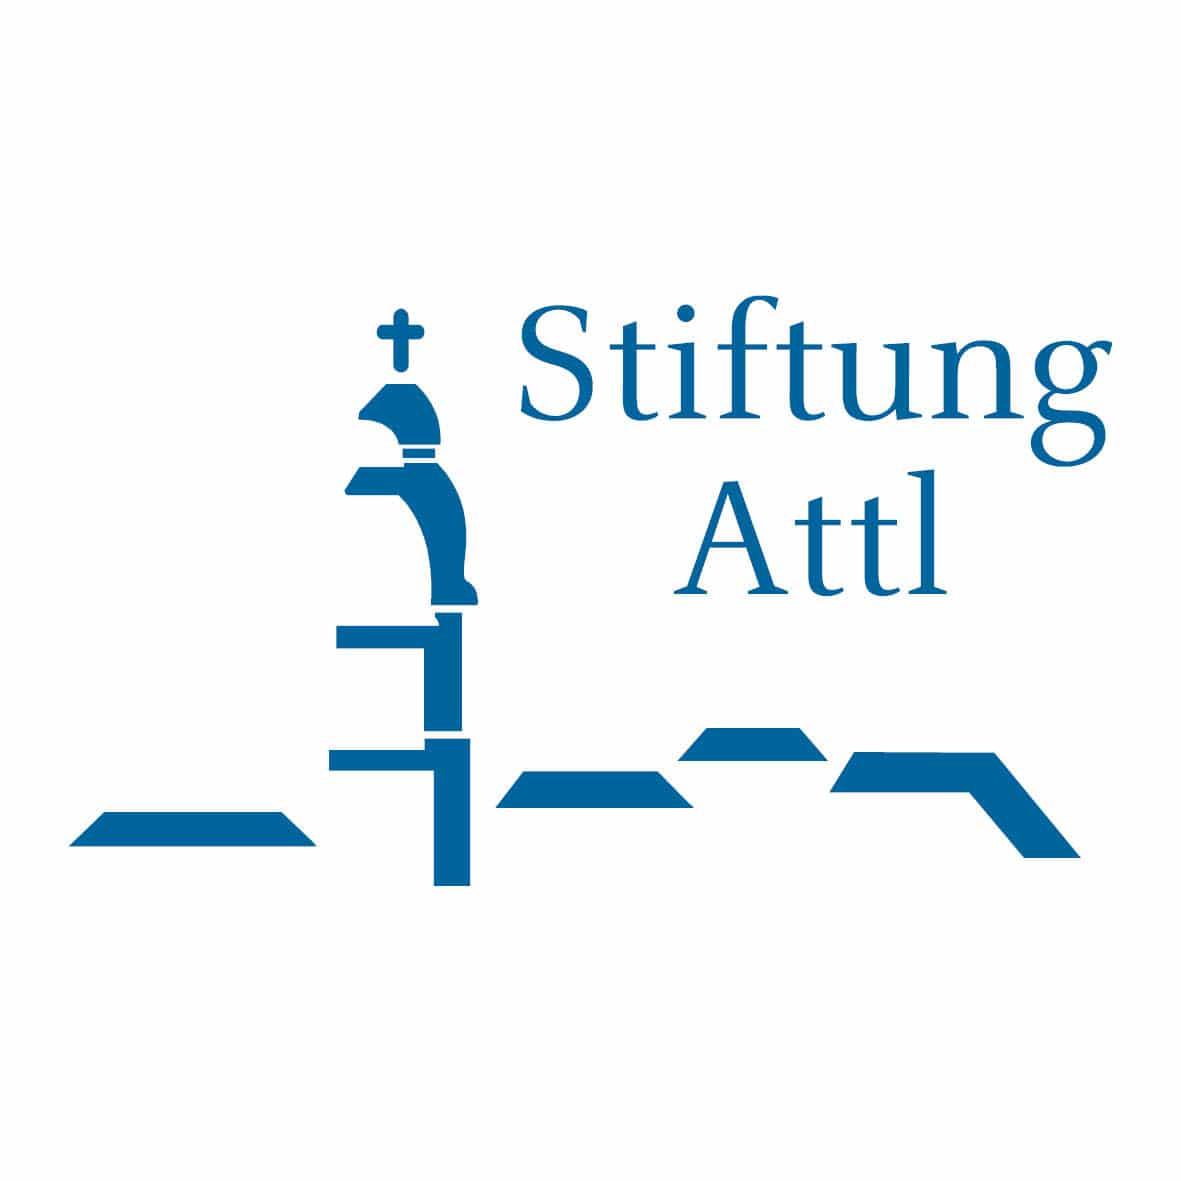 Logo Gärtnerei der Stiftung Attl